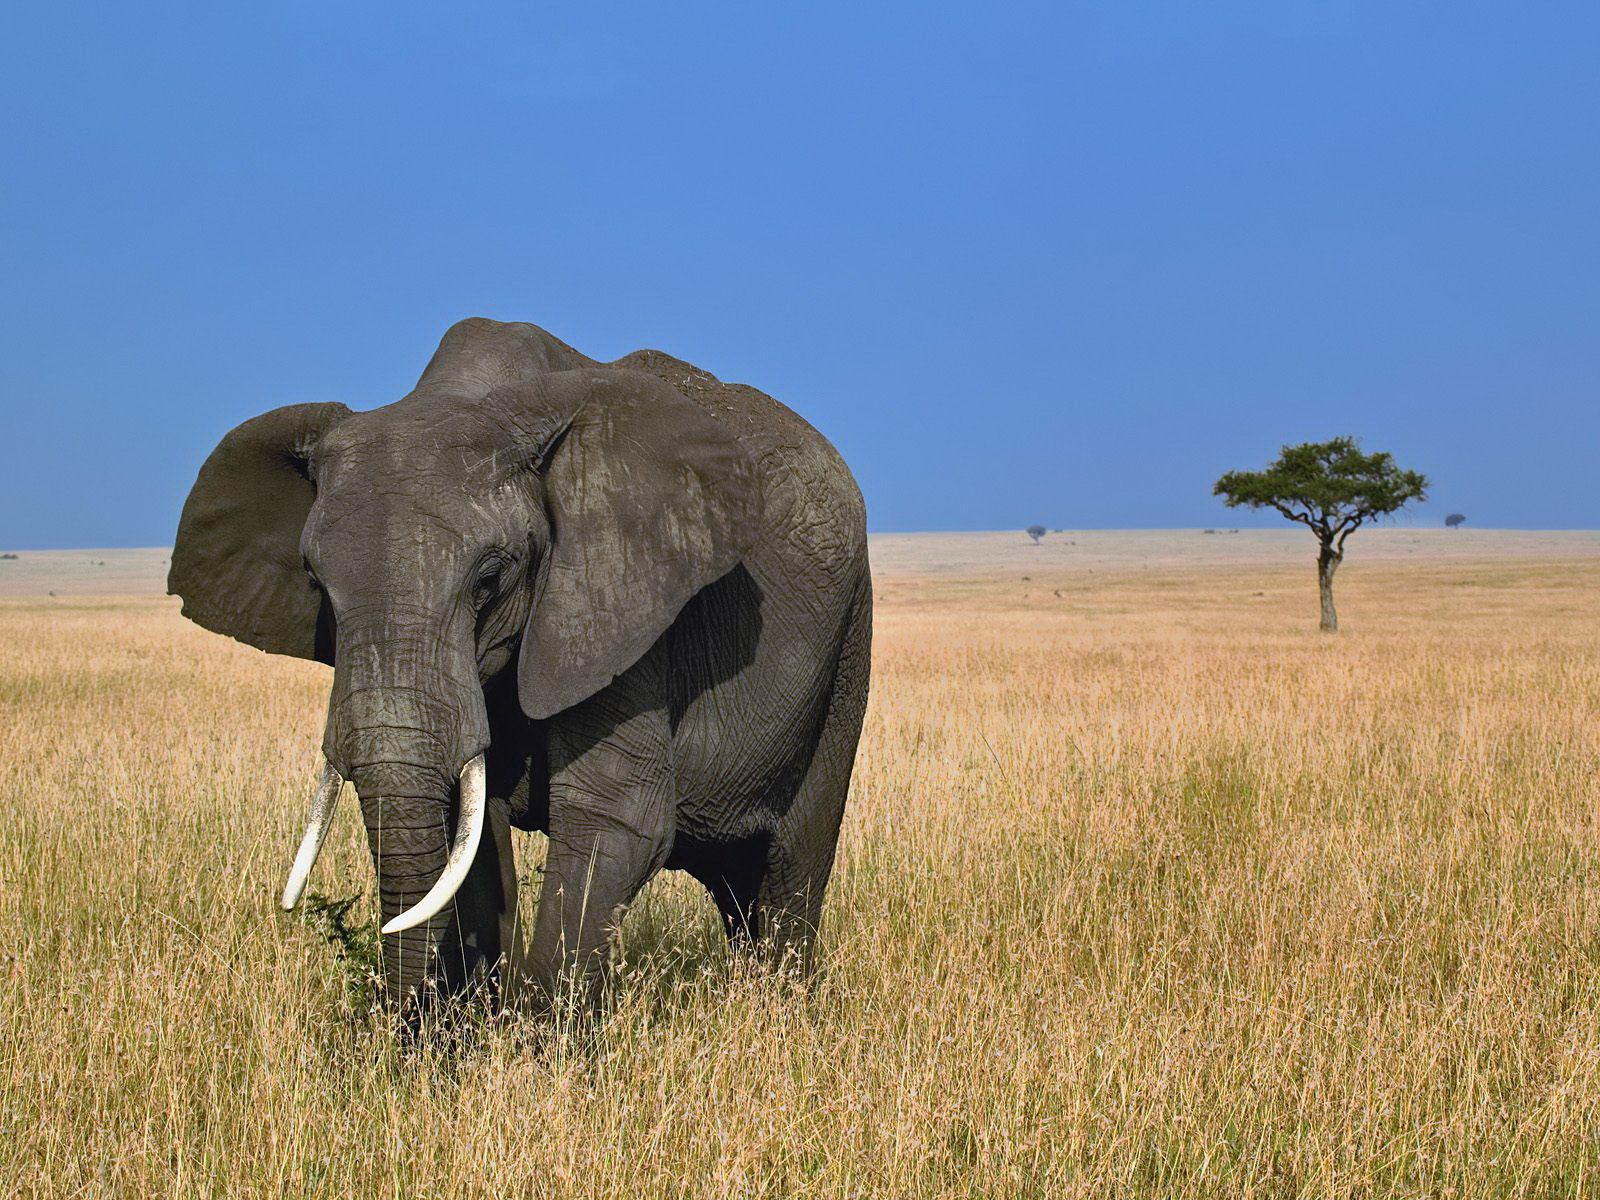 african elephant african elephant african elephant african elephant